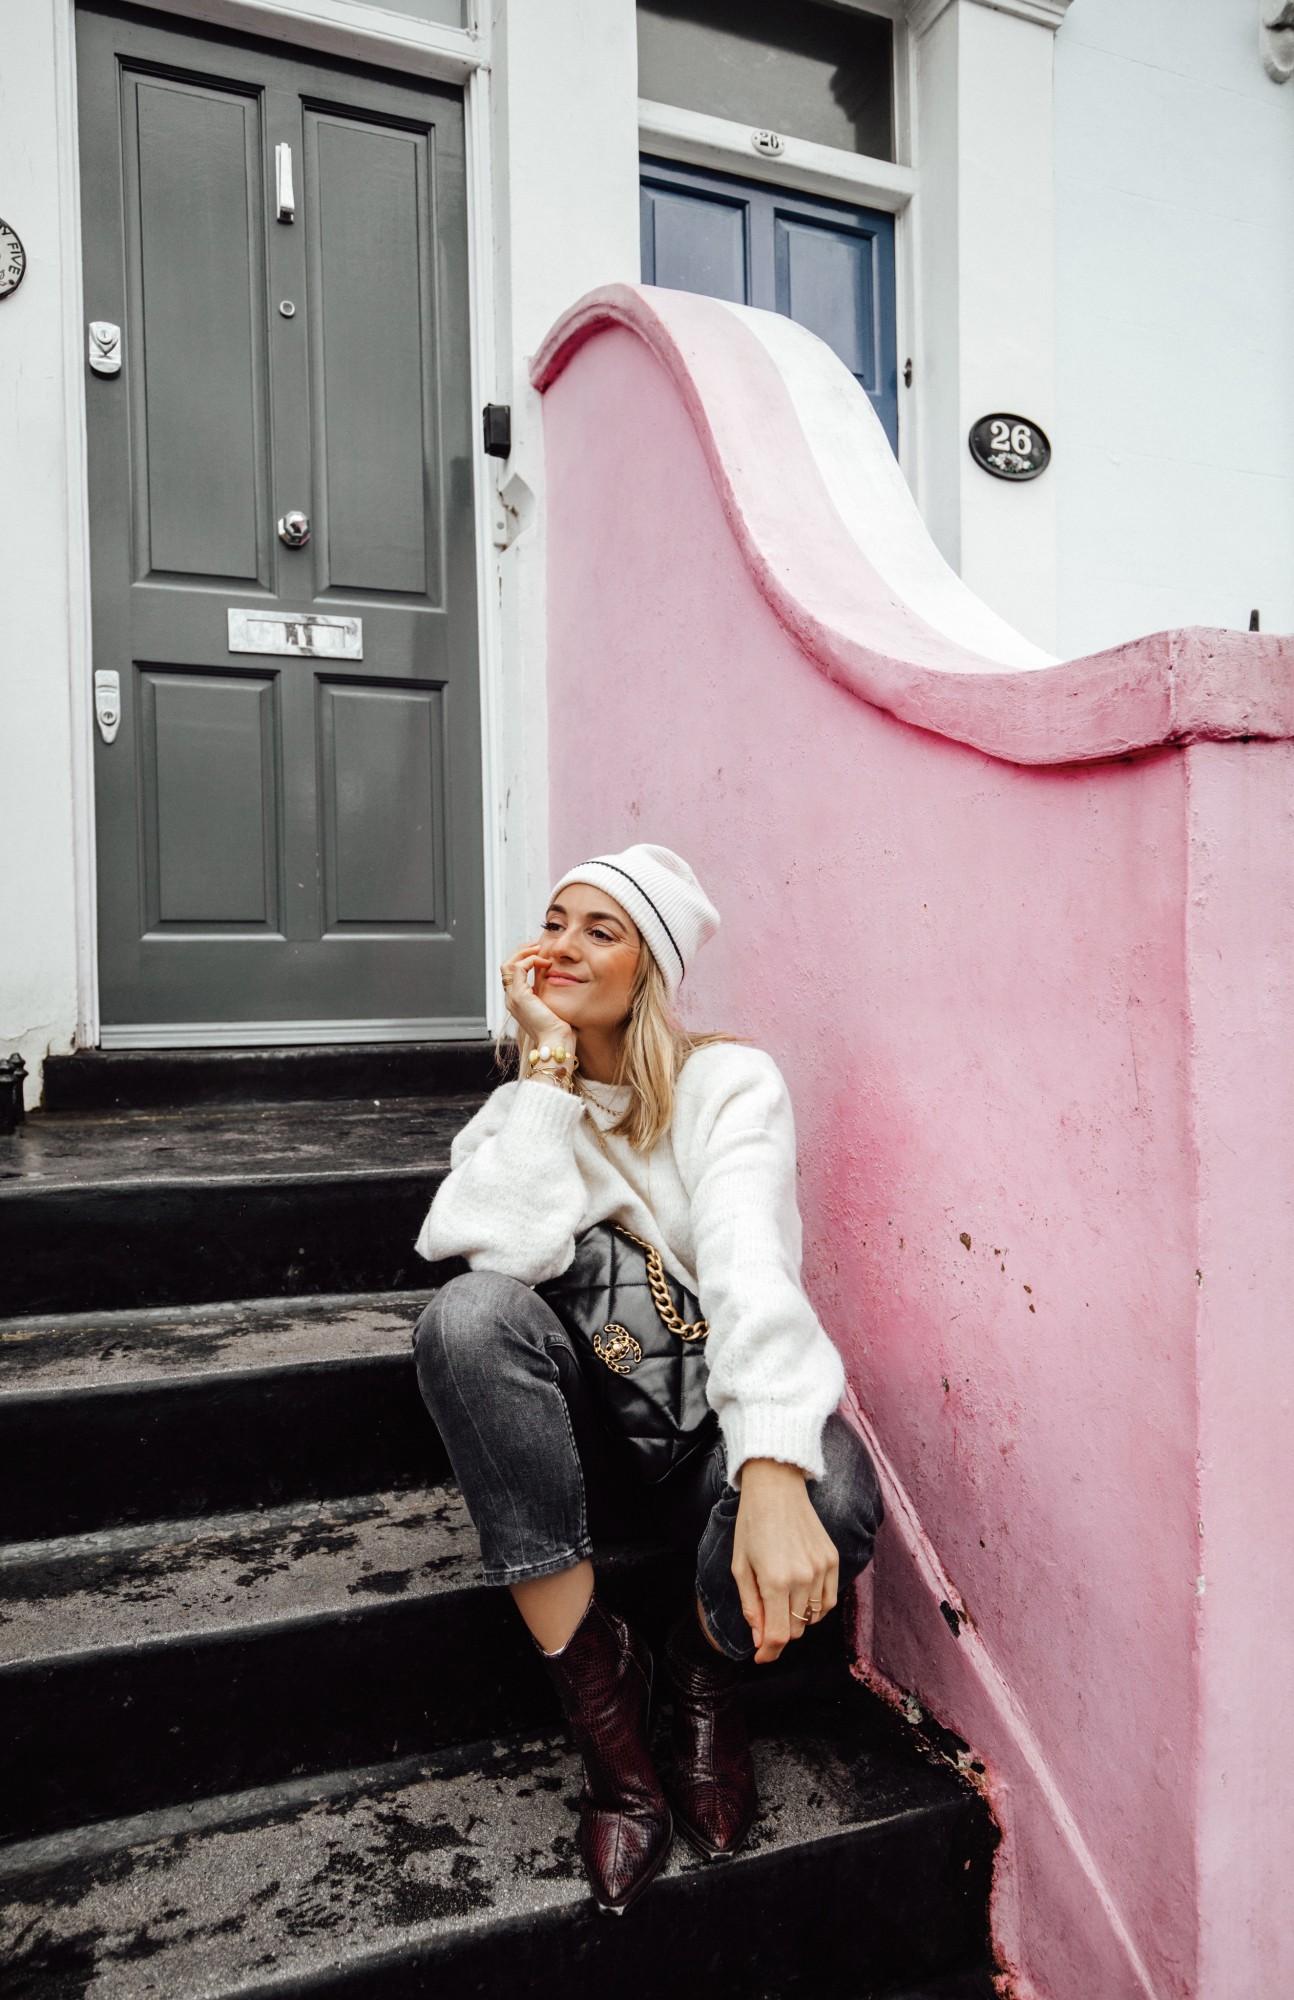 Visiter Notting Hill Londres - Blondie Baby blog voyages